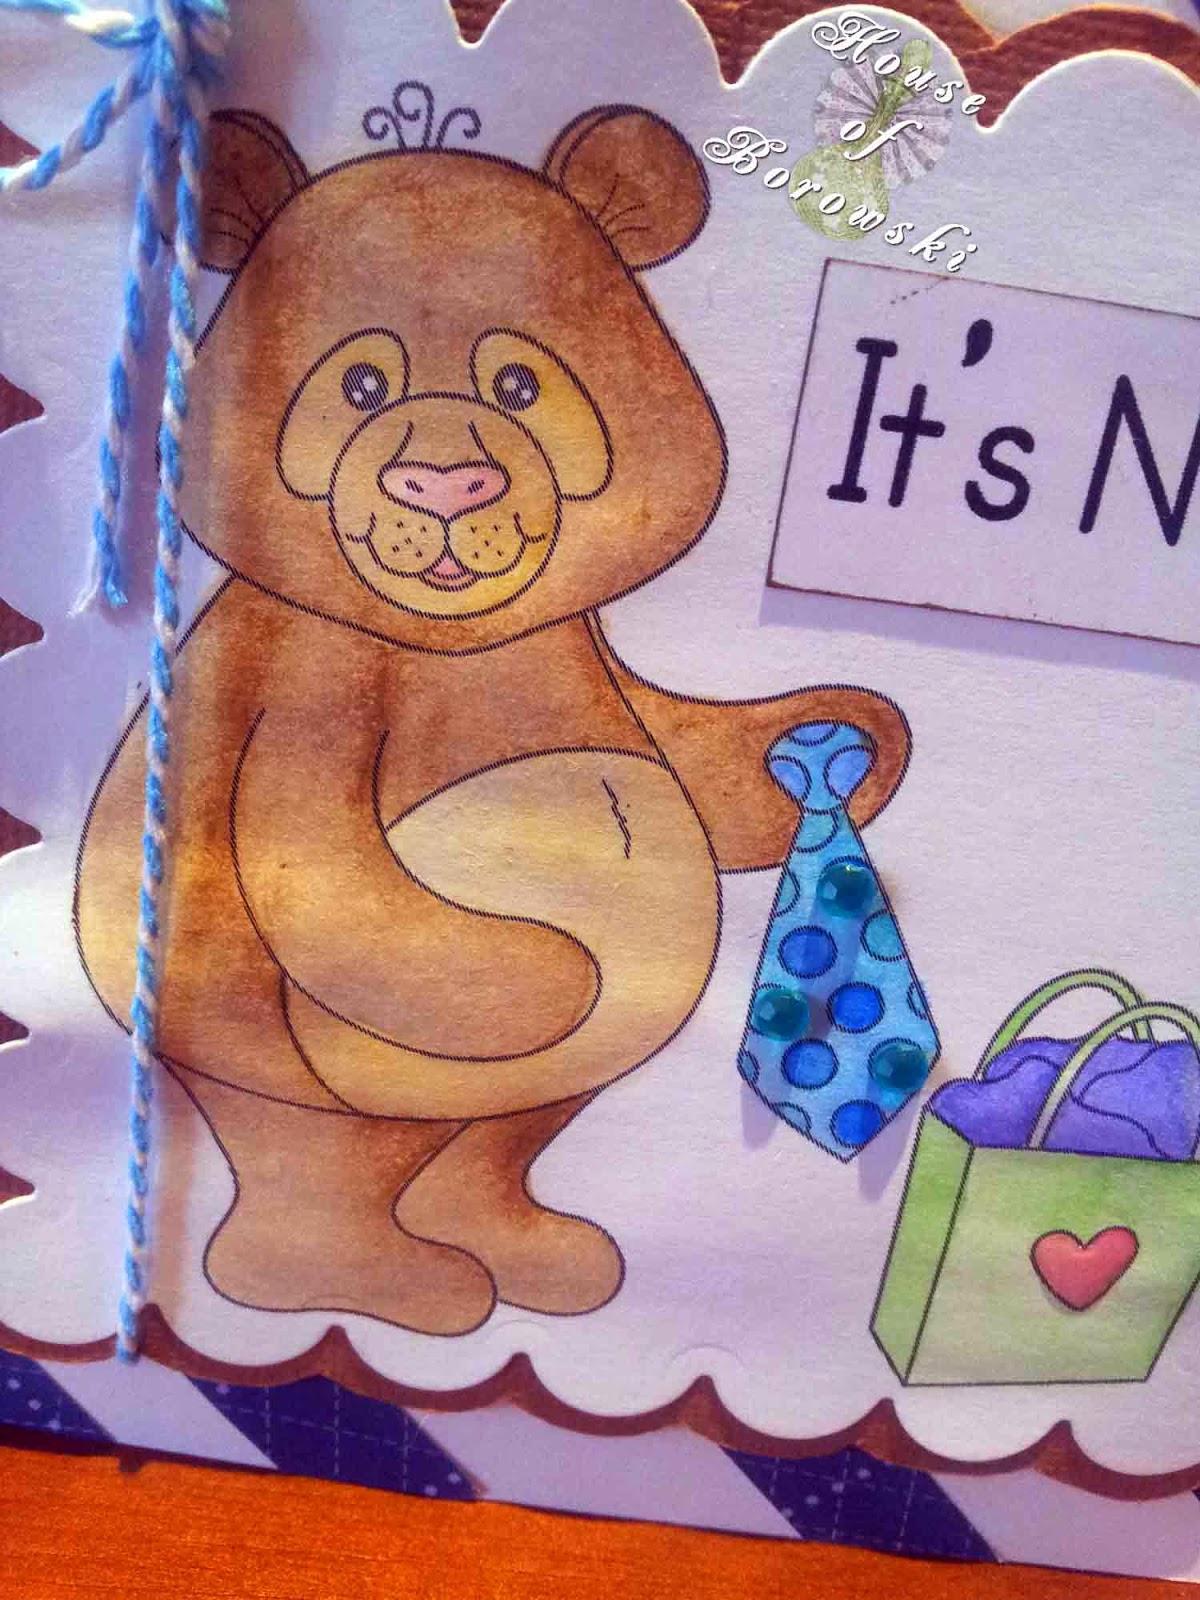 Deedee's Digis Its Not a Tie, Lyra watercolour crayons